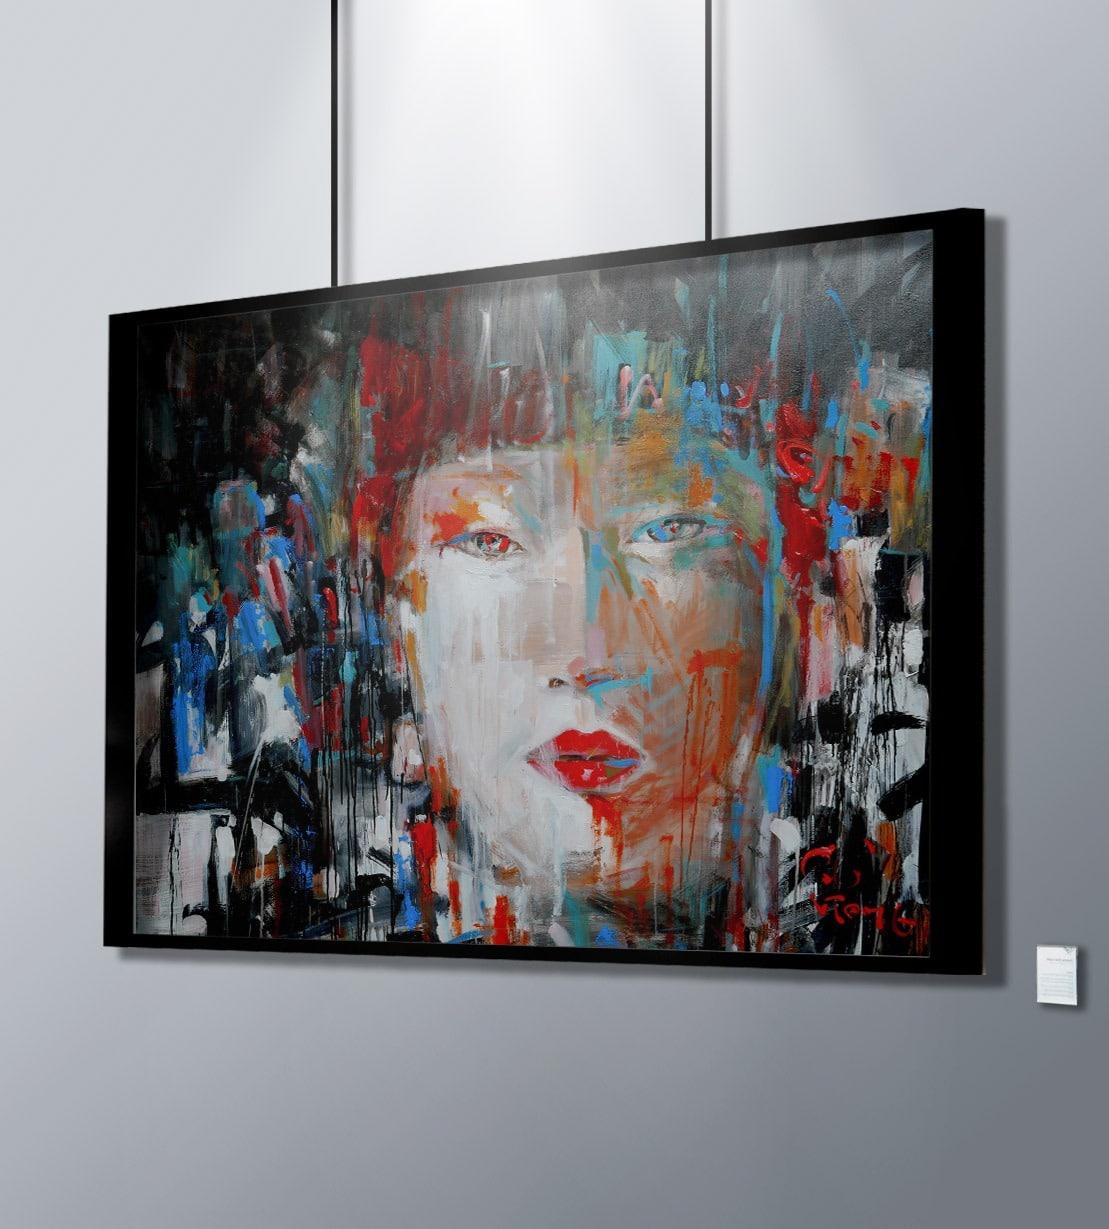 Van Tame Shialing my girl Galerie Don Carli